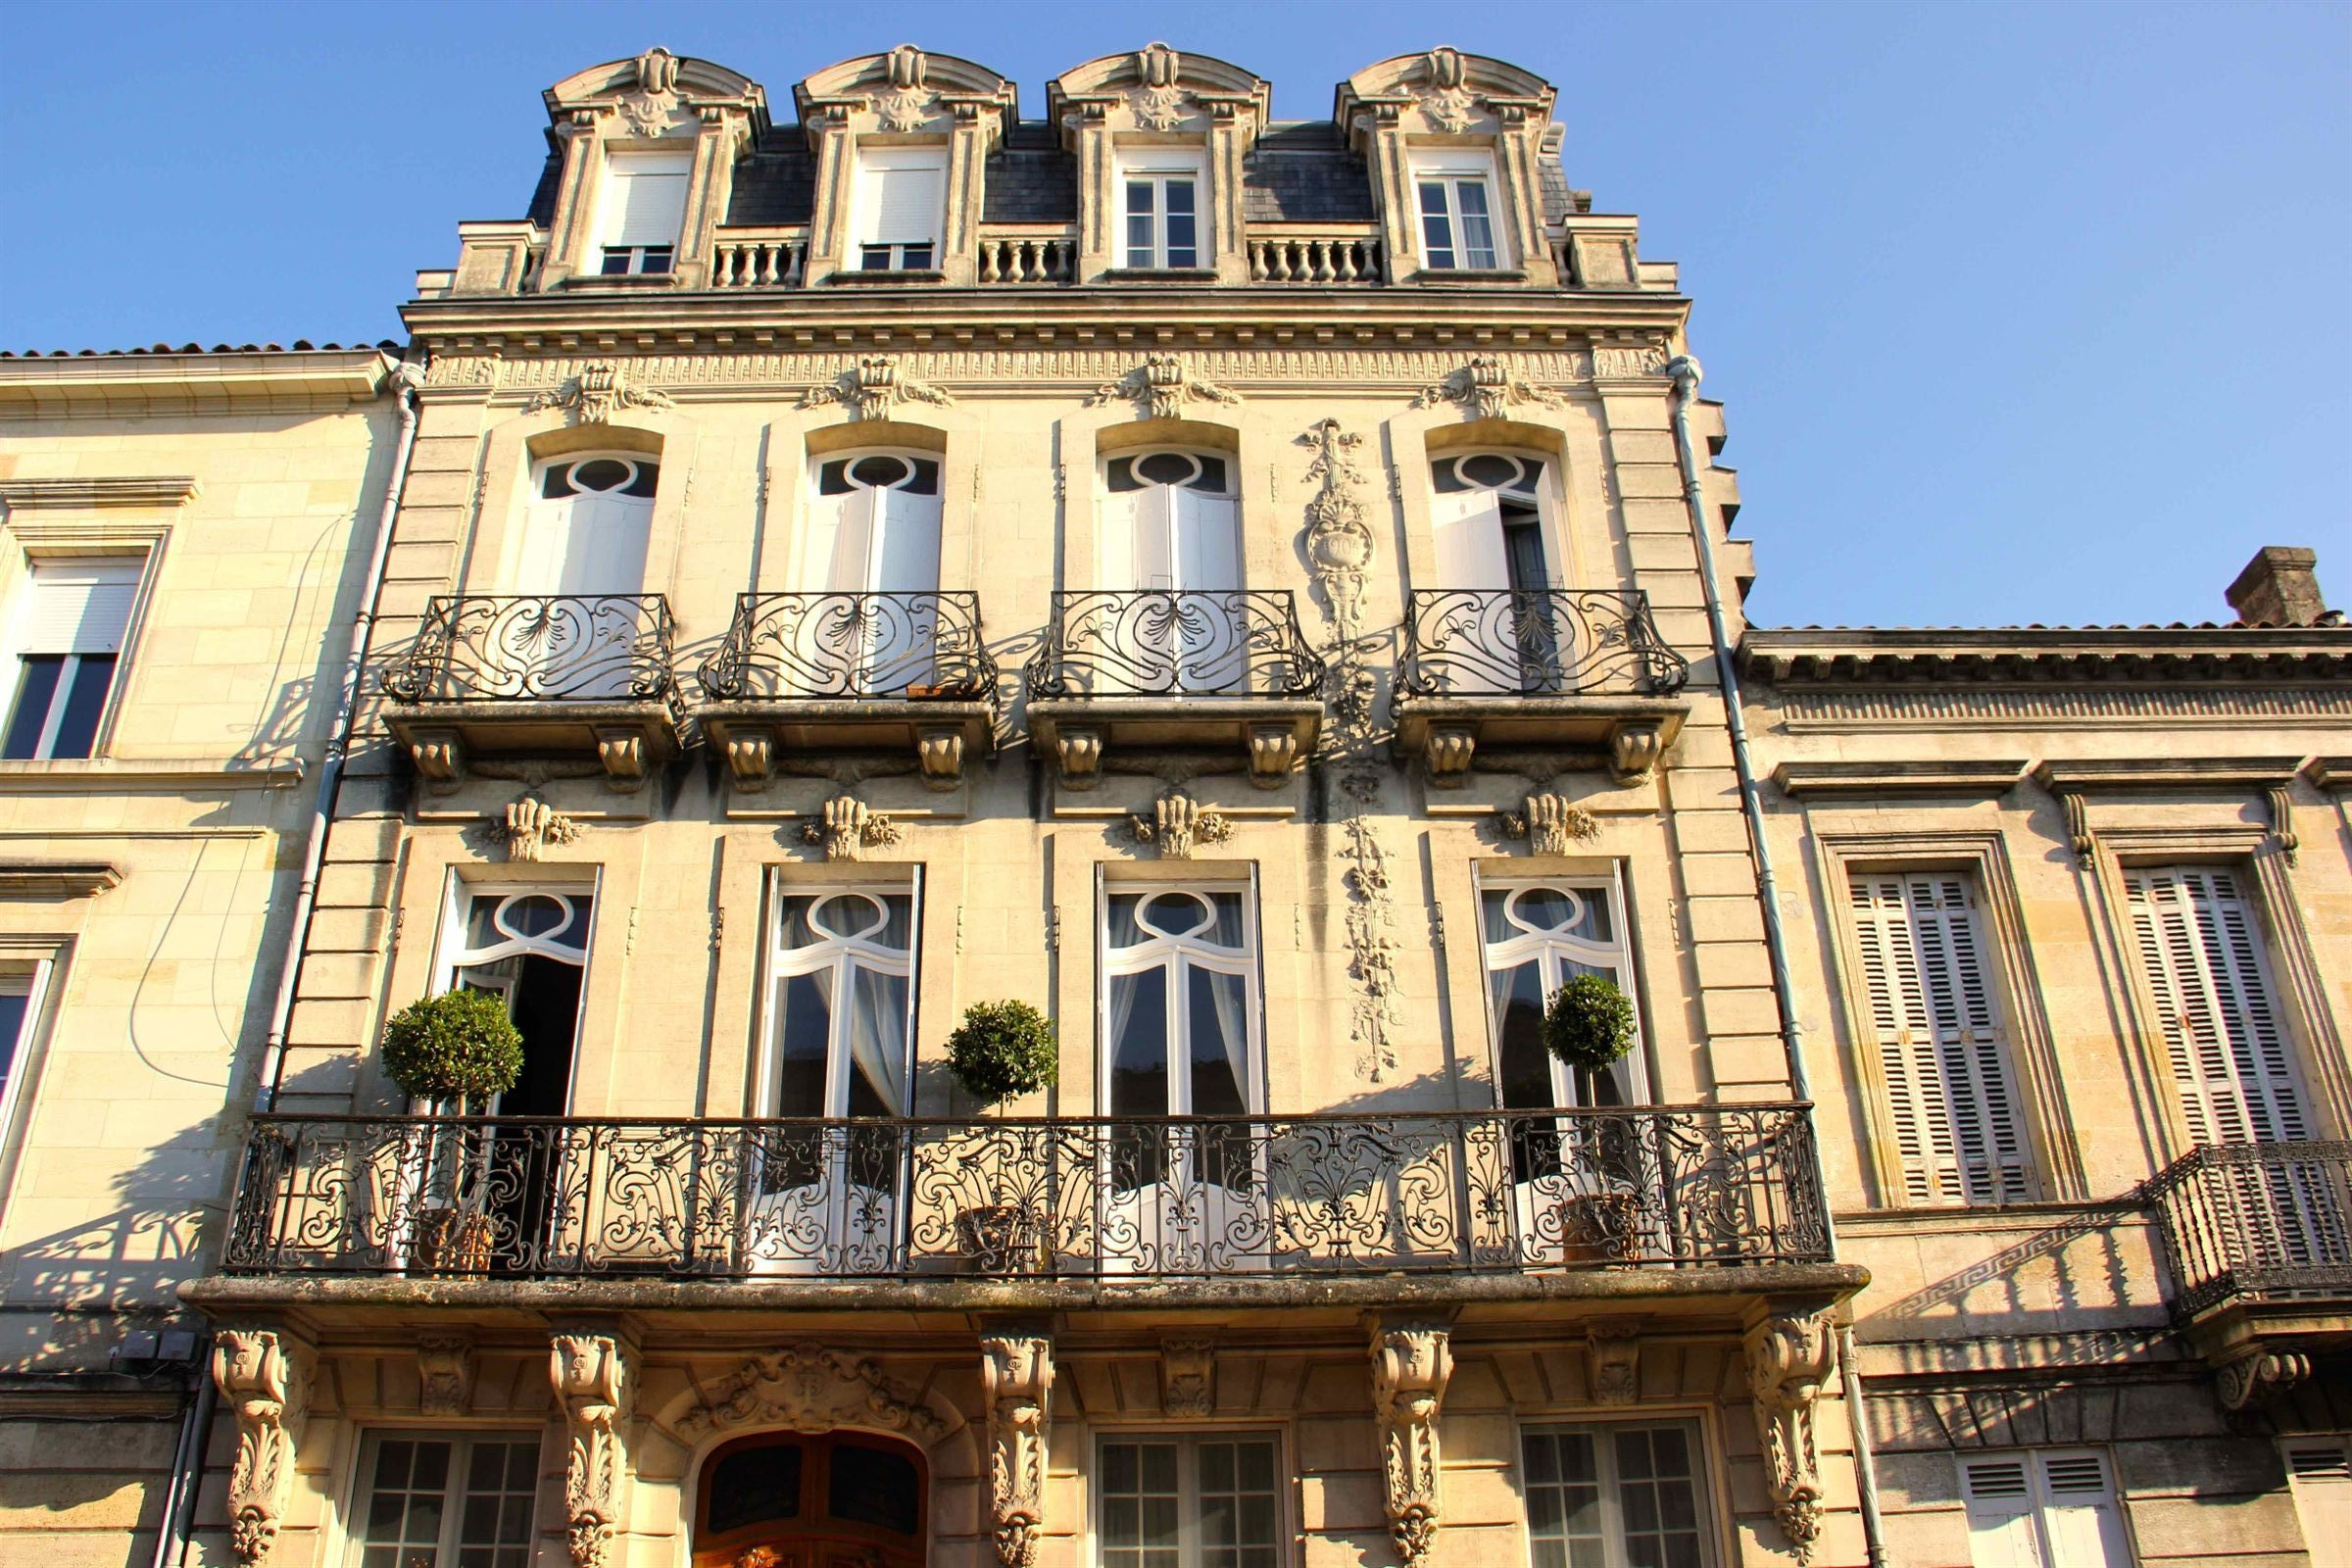 Casa Unifamiliar por un Venta en BORDEAUX - DOWNTOWN - LUXURY PRIVATE MANSION Bordeaux, Aquitania, 33000 Francia